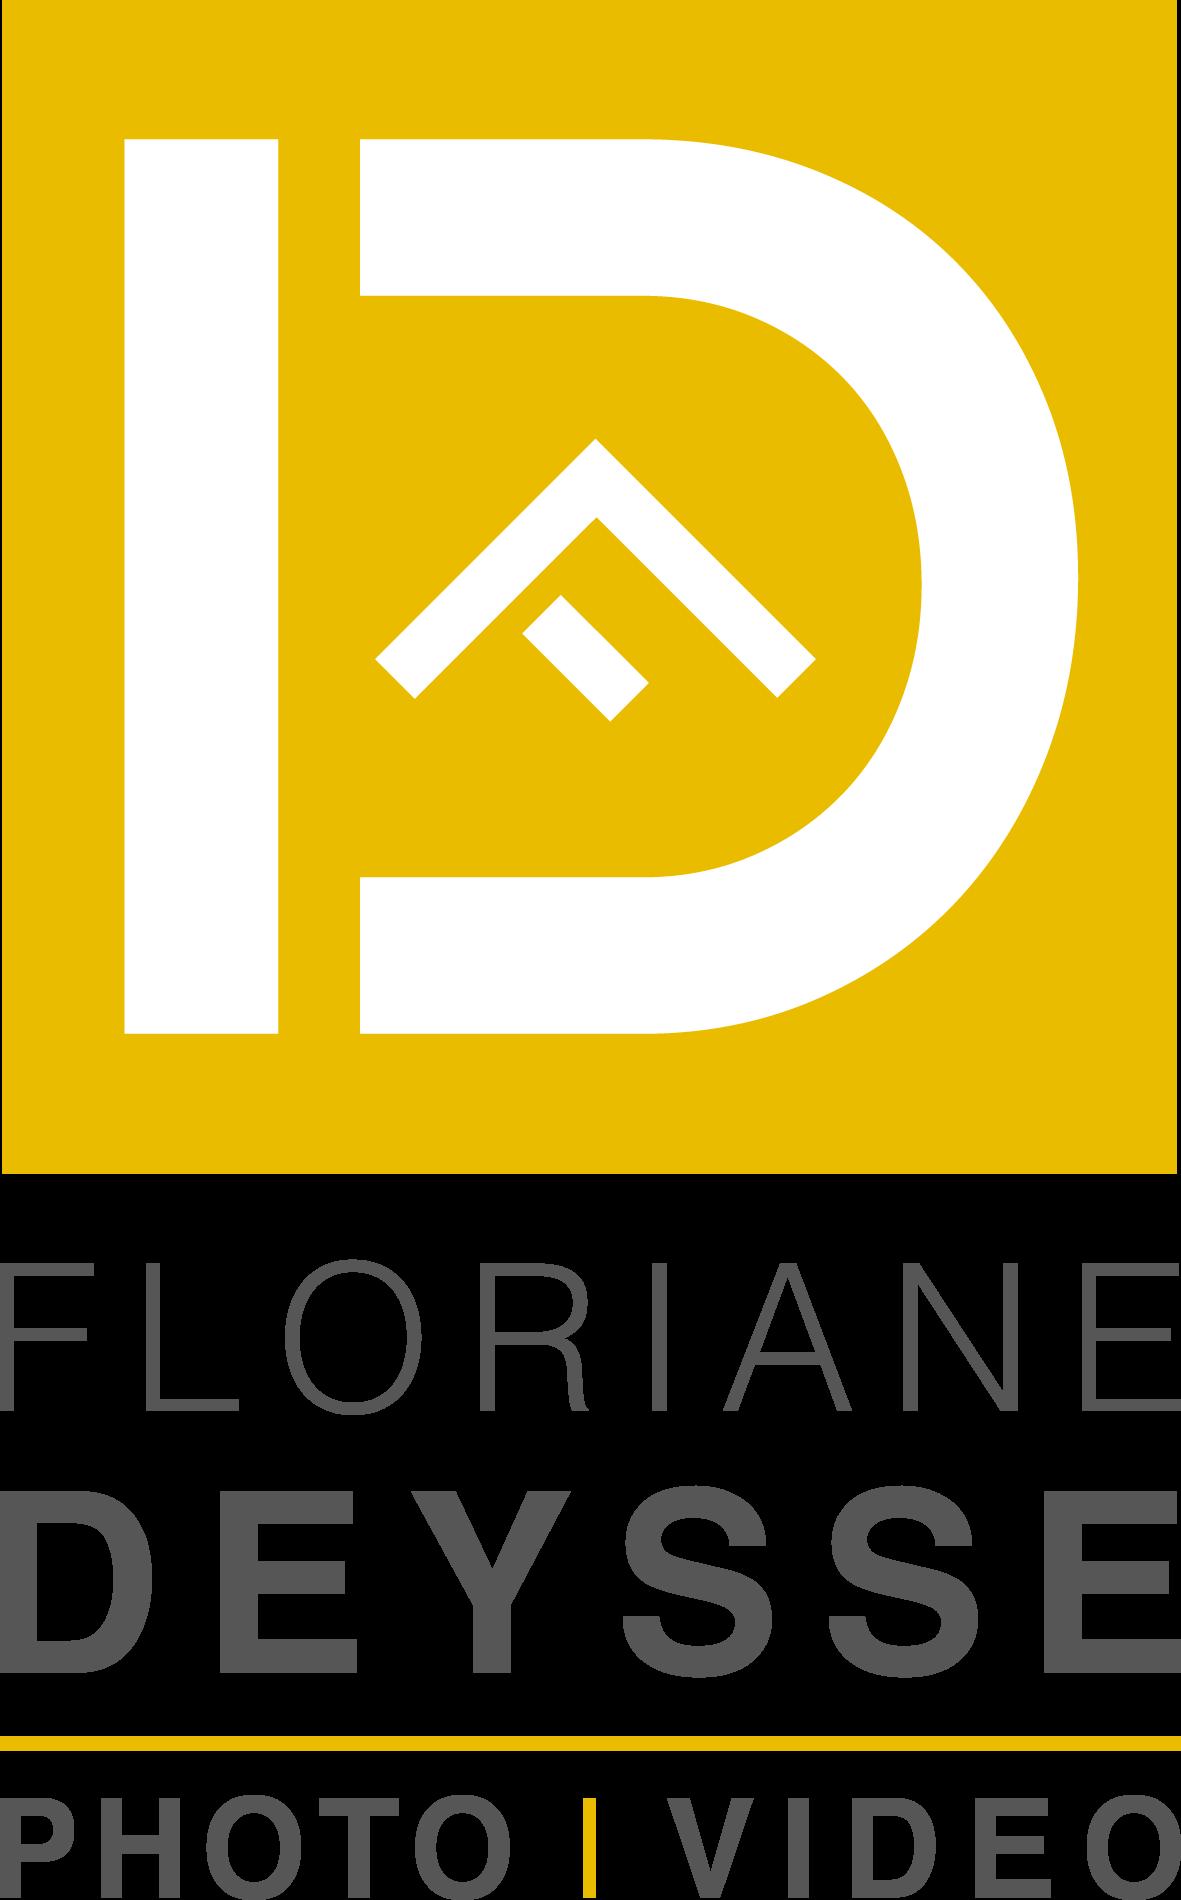 FDeysse-Logo-FondCouleur-Jaune